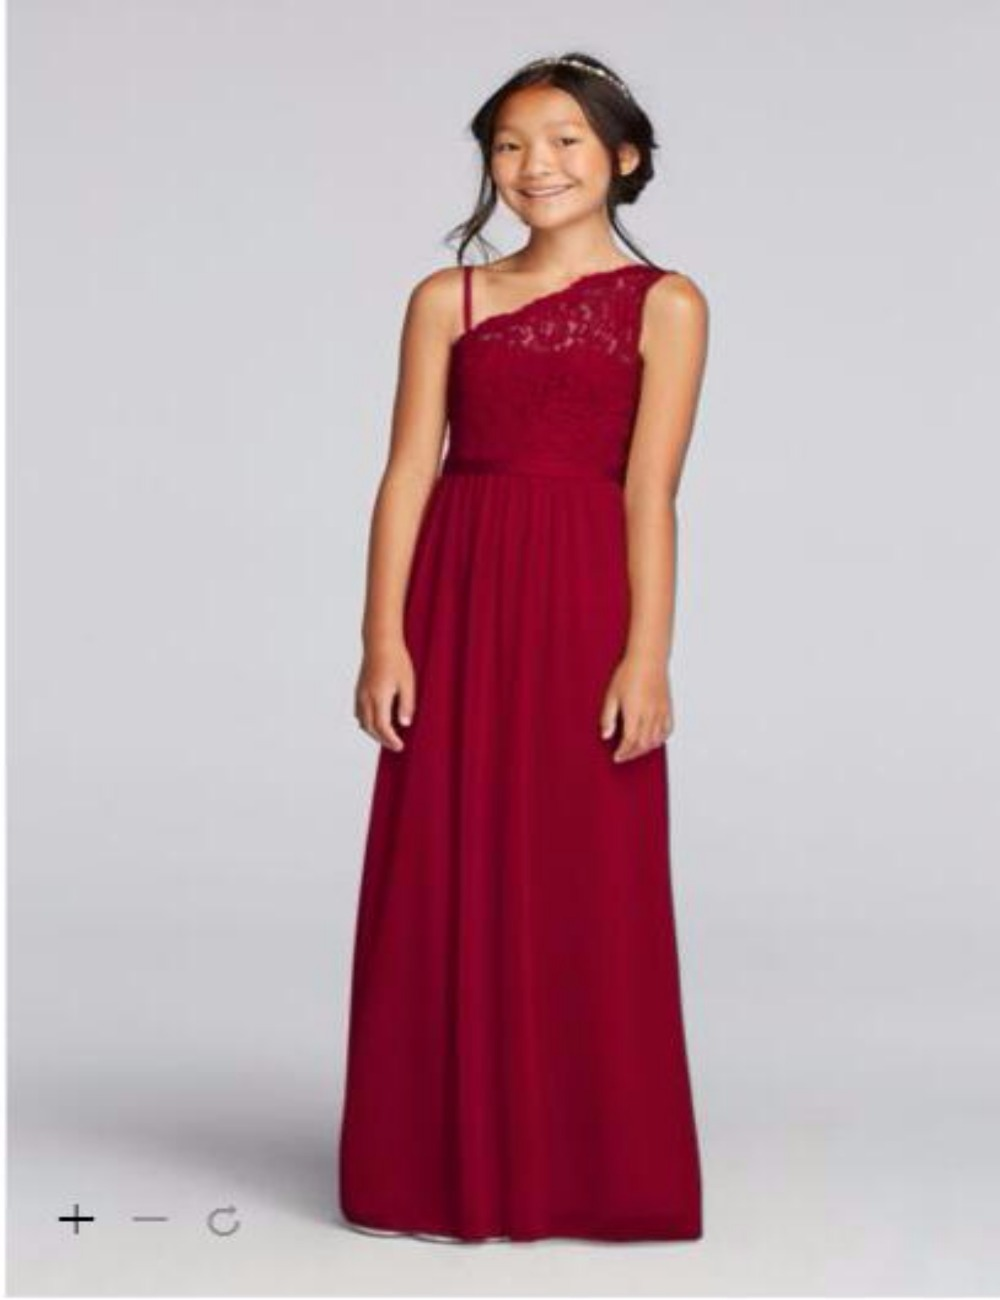 Junior red dresses best dressed junior red dresses ombrellifo Choice Image